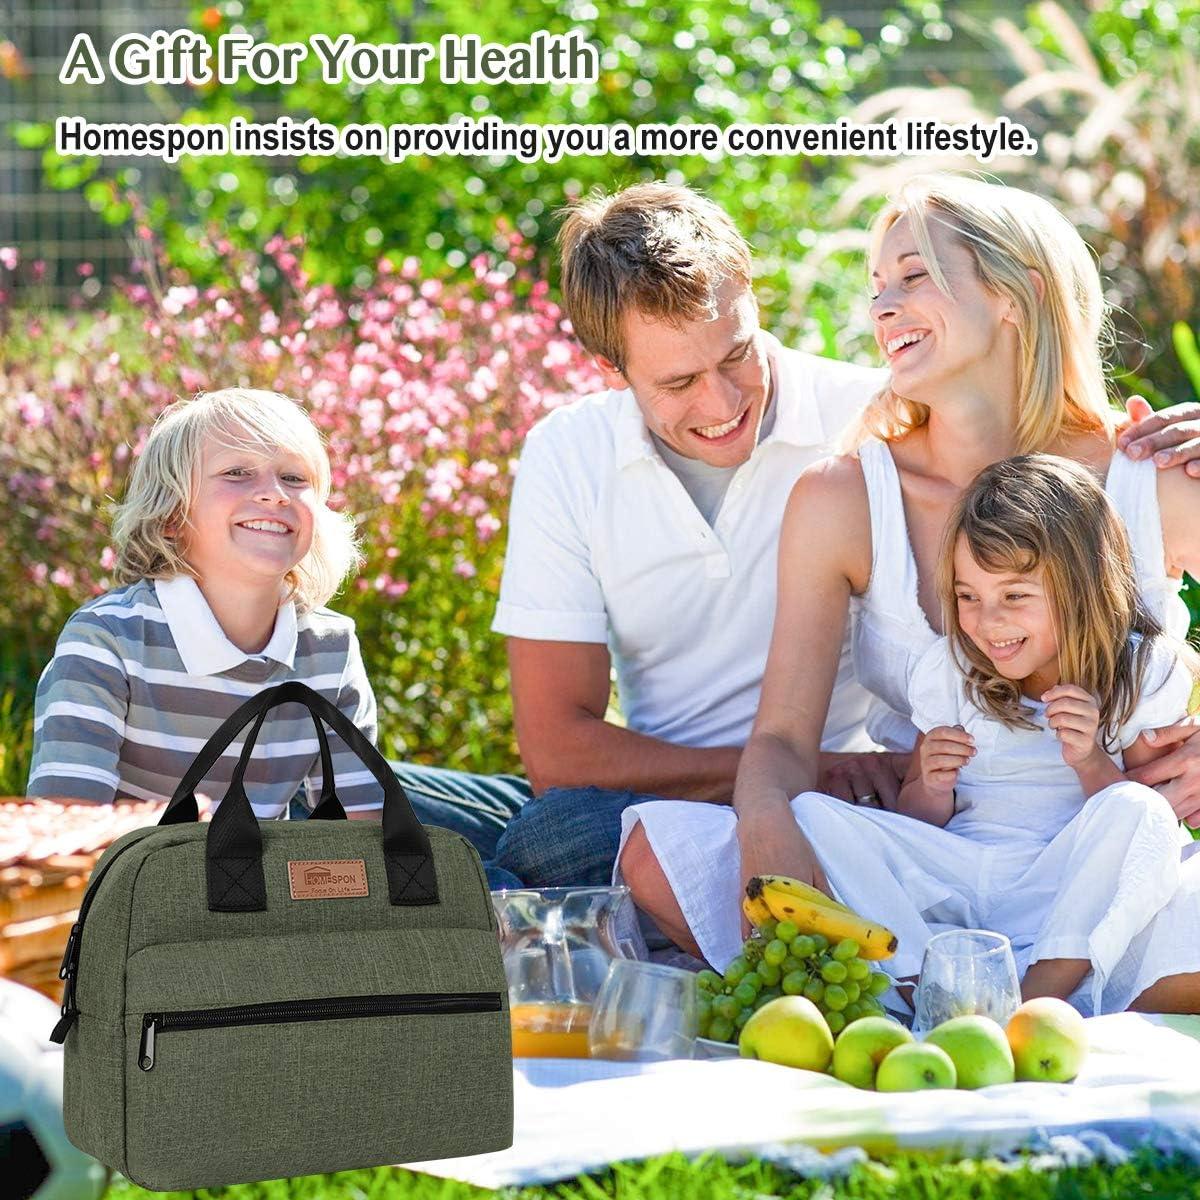 Adultos Estudiantes y Ni/ños HOMESPON Bolsa Isot/érmica de Almuerzo Lunch Bag Bolsa T/érmica Porta Alimentos Tela Impermeable Plegable Bolso de Picnic para Mujeres